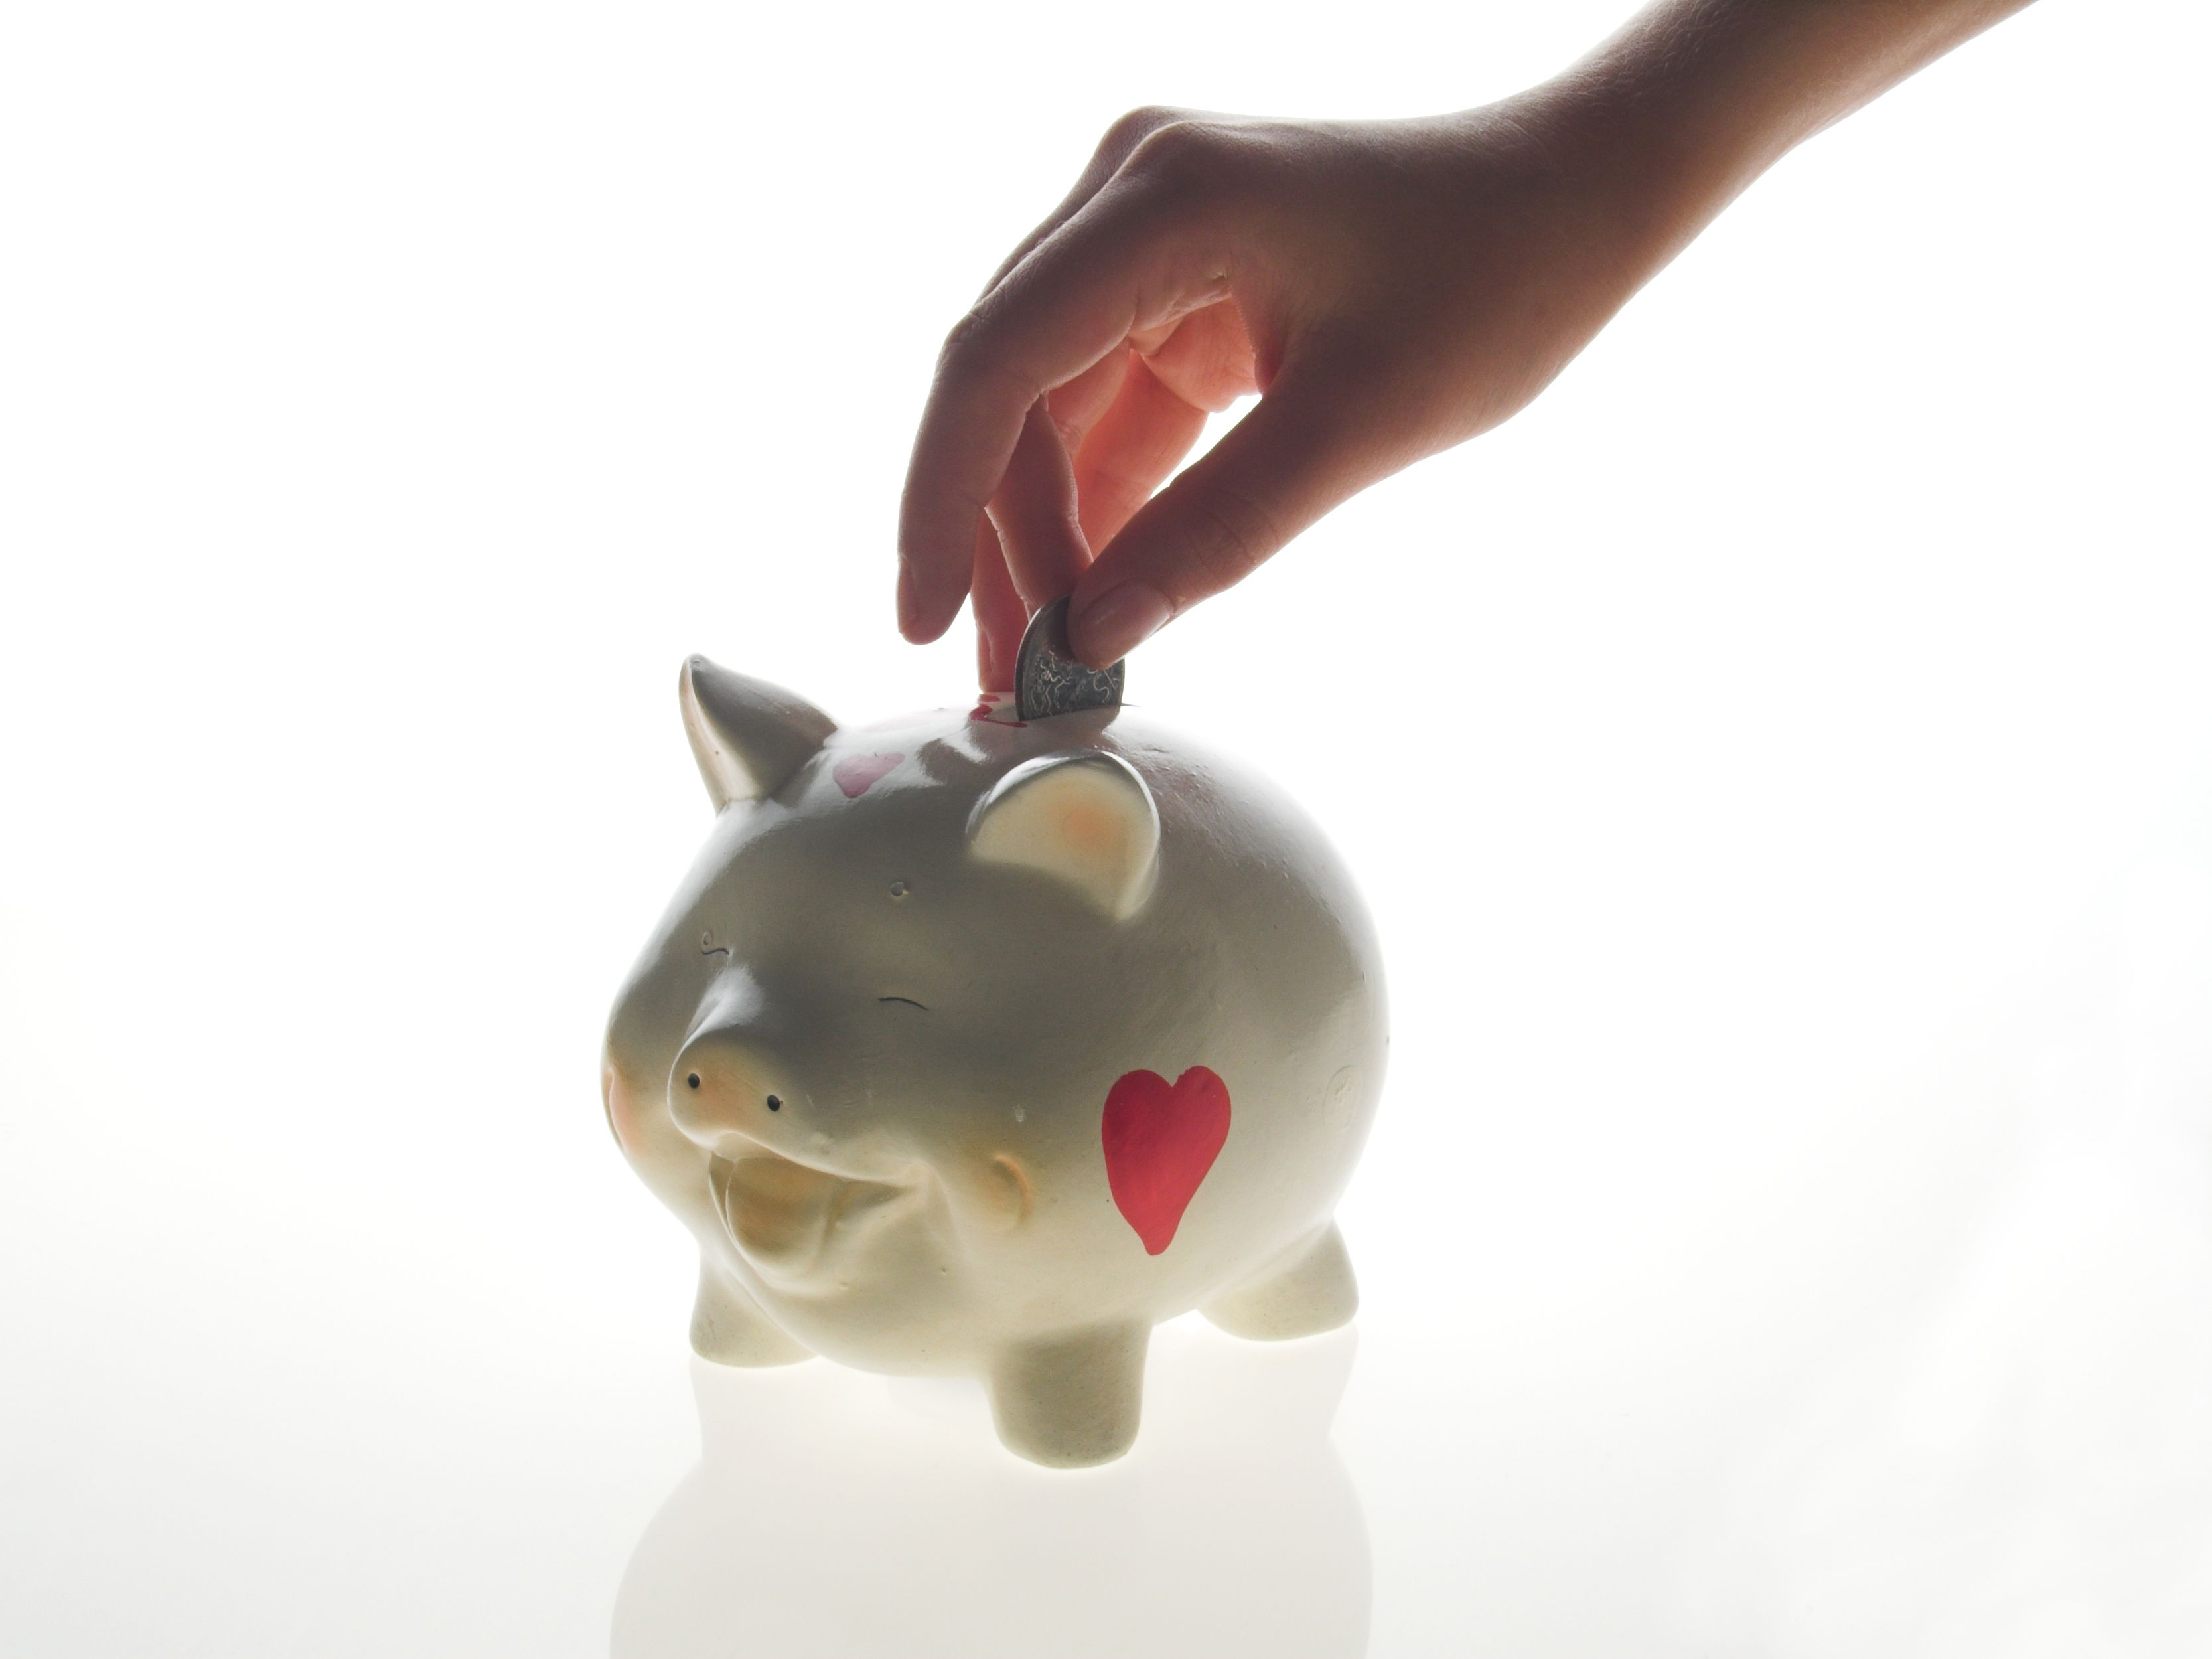 Health Insurance Tips From Cnn